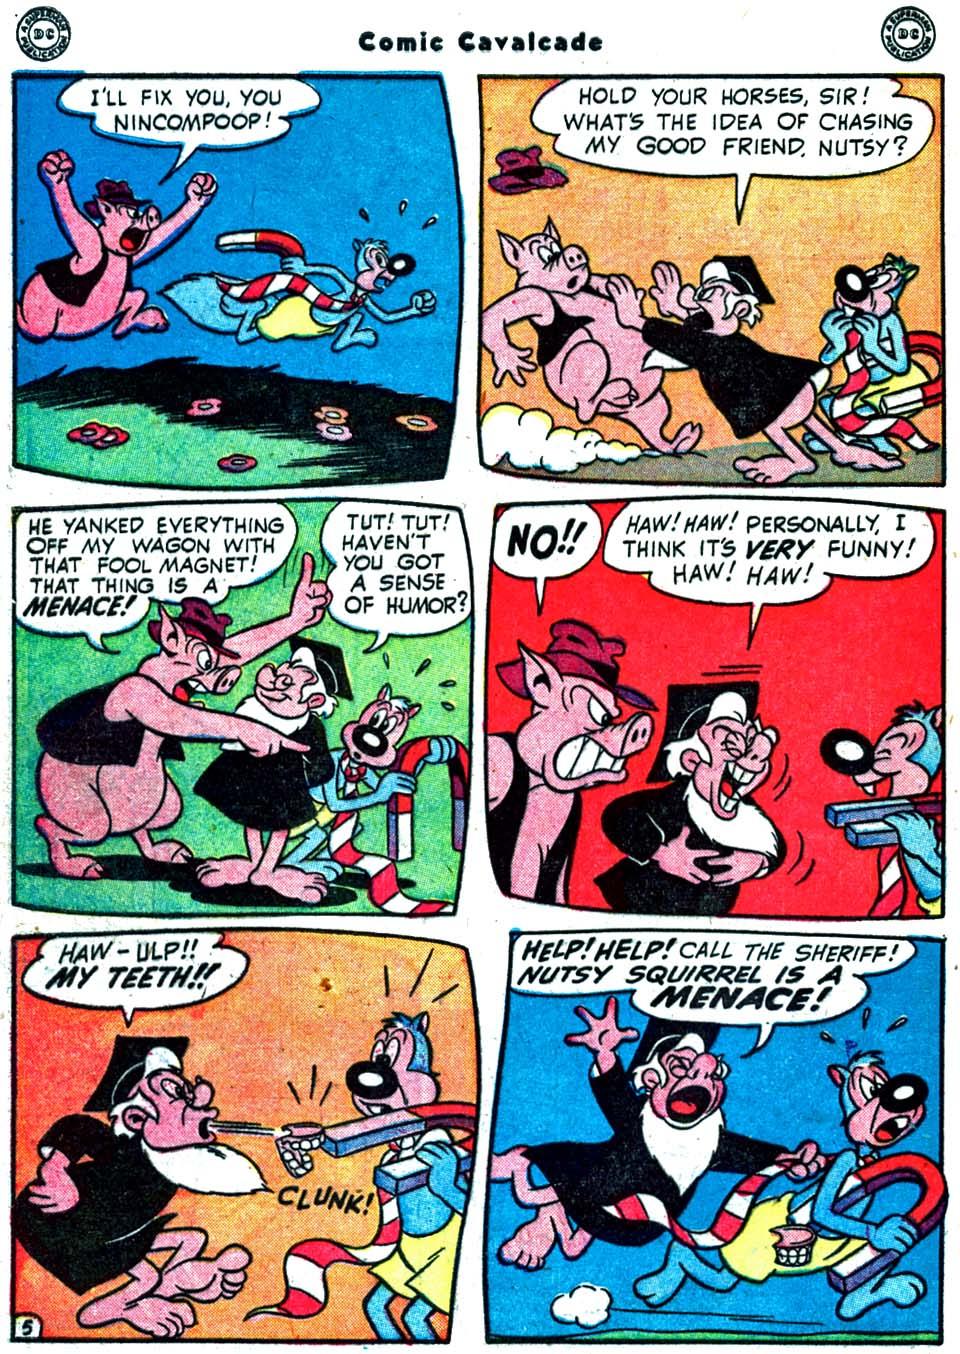 Comic Cavalcade issue 32 - Page 40